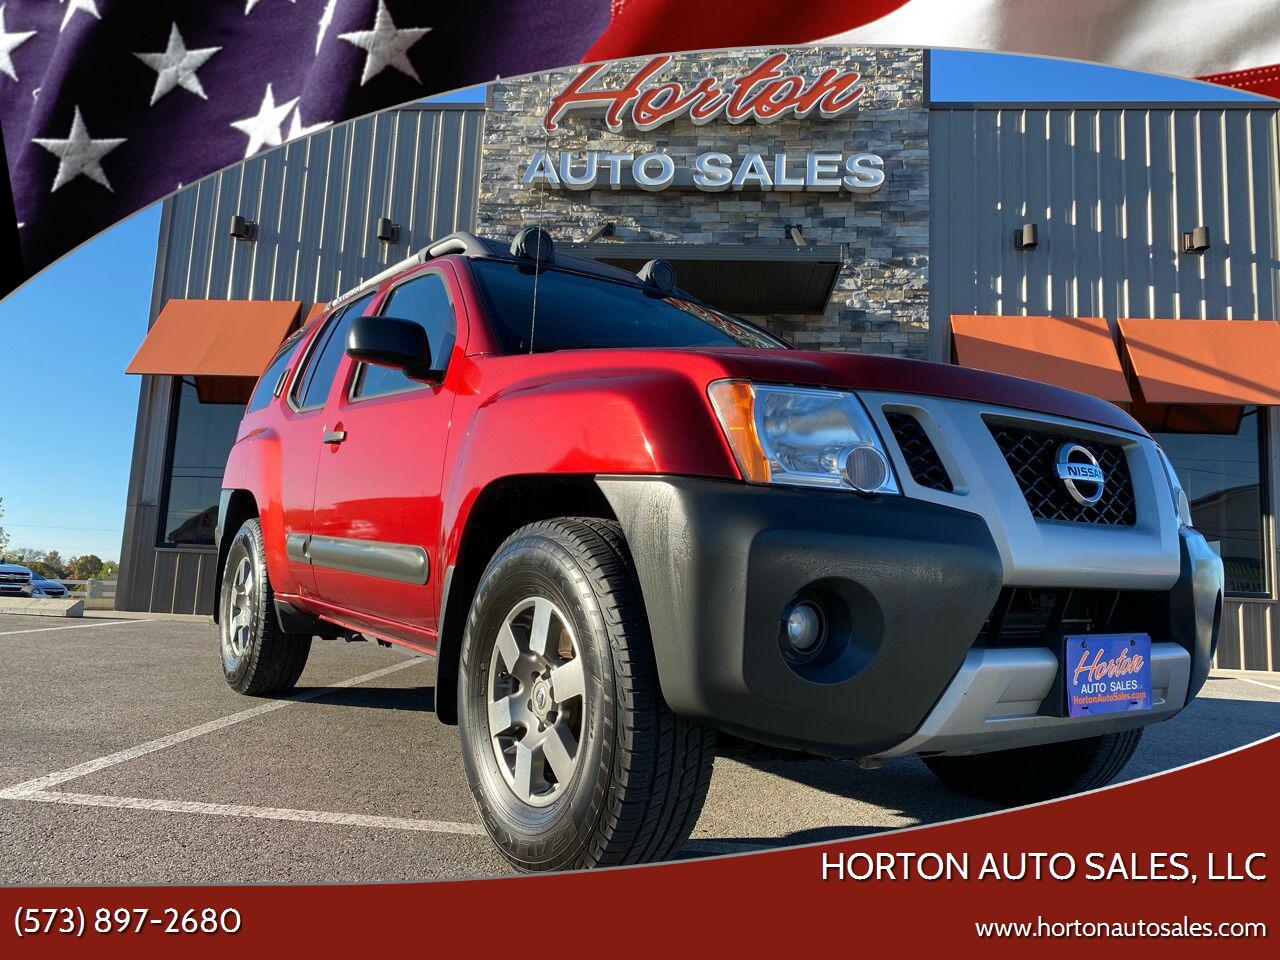 gvkgmmus1lqdpm https www carsforsale com used car dealer horton auto sales llc linn mo d503197